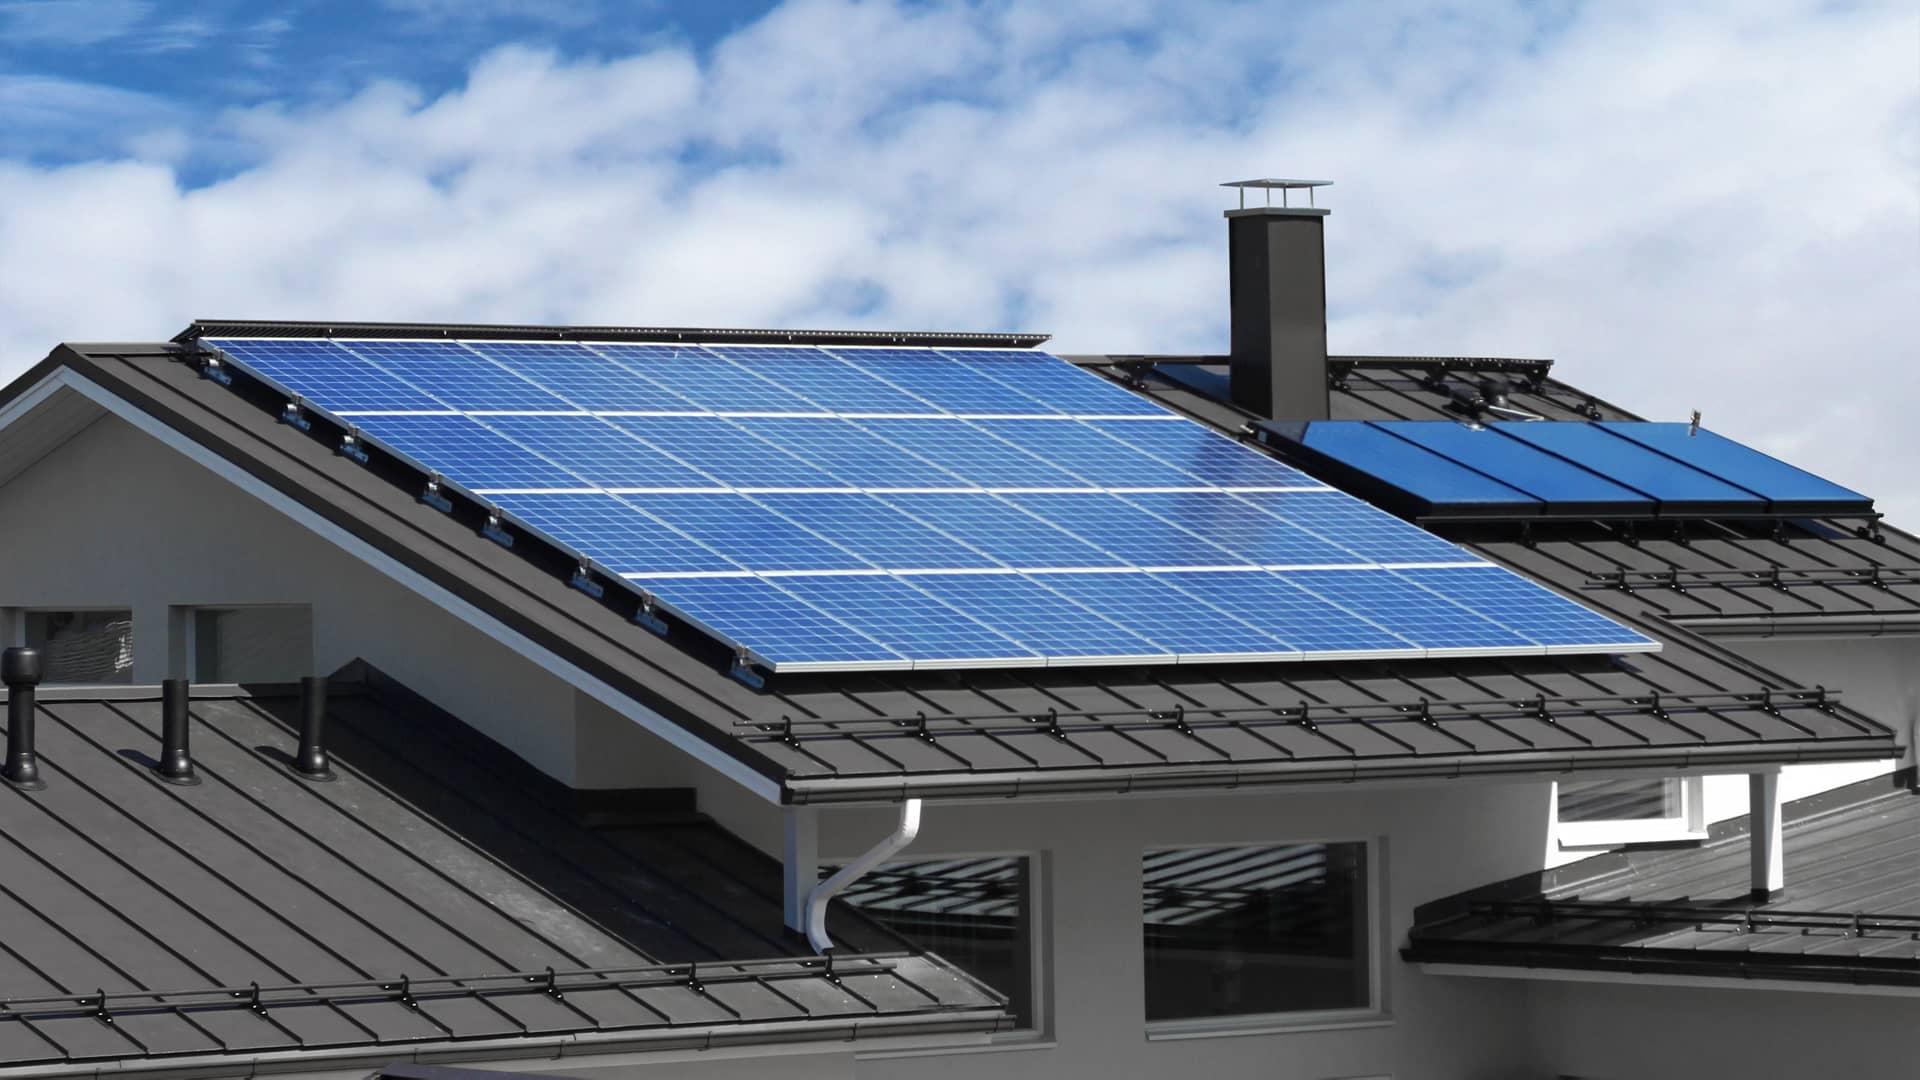 effizienzhaus photovoltaik anlage